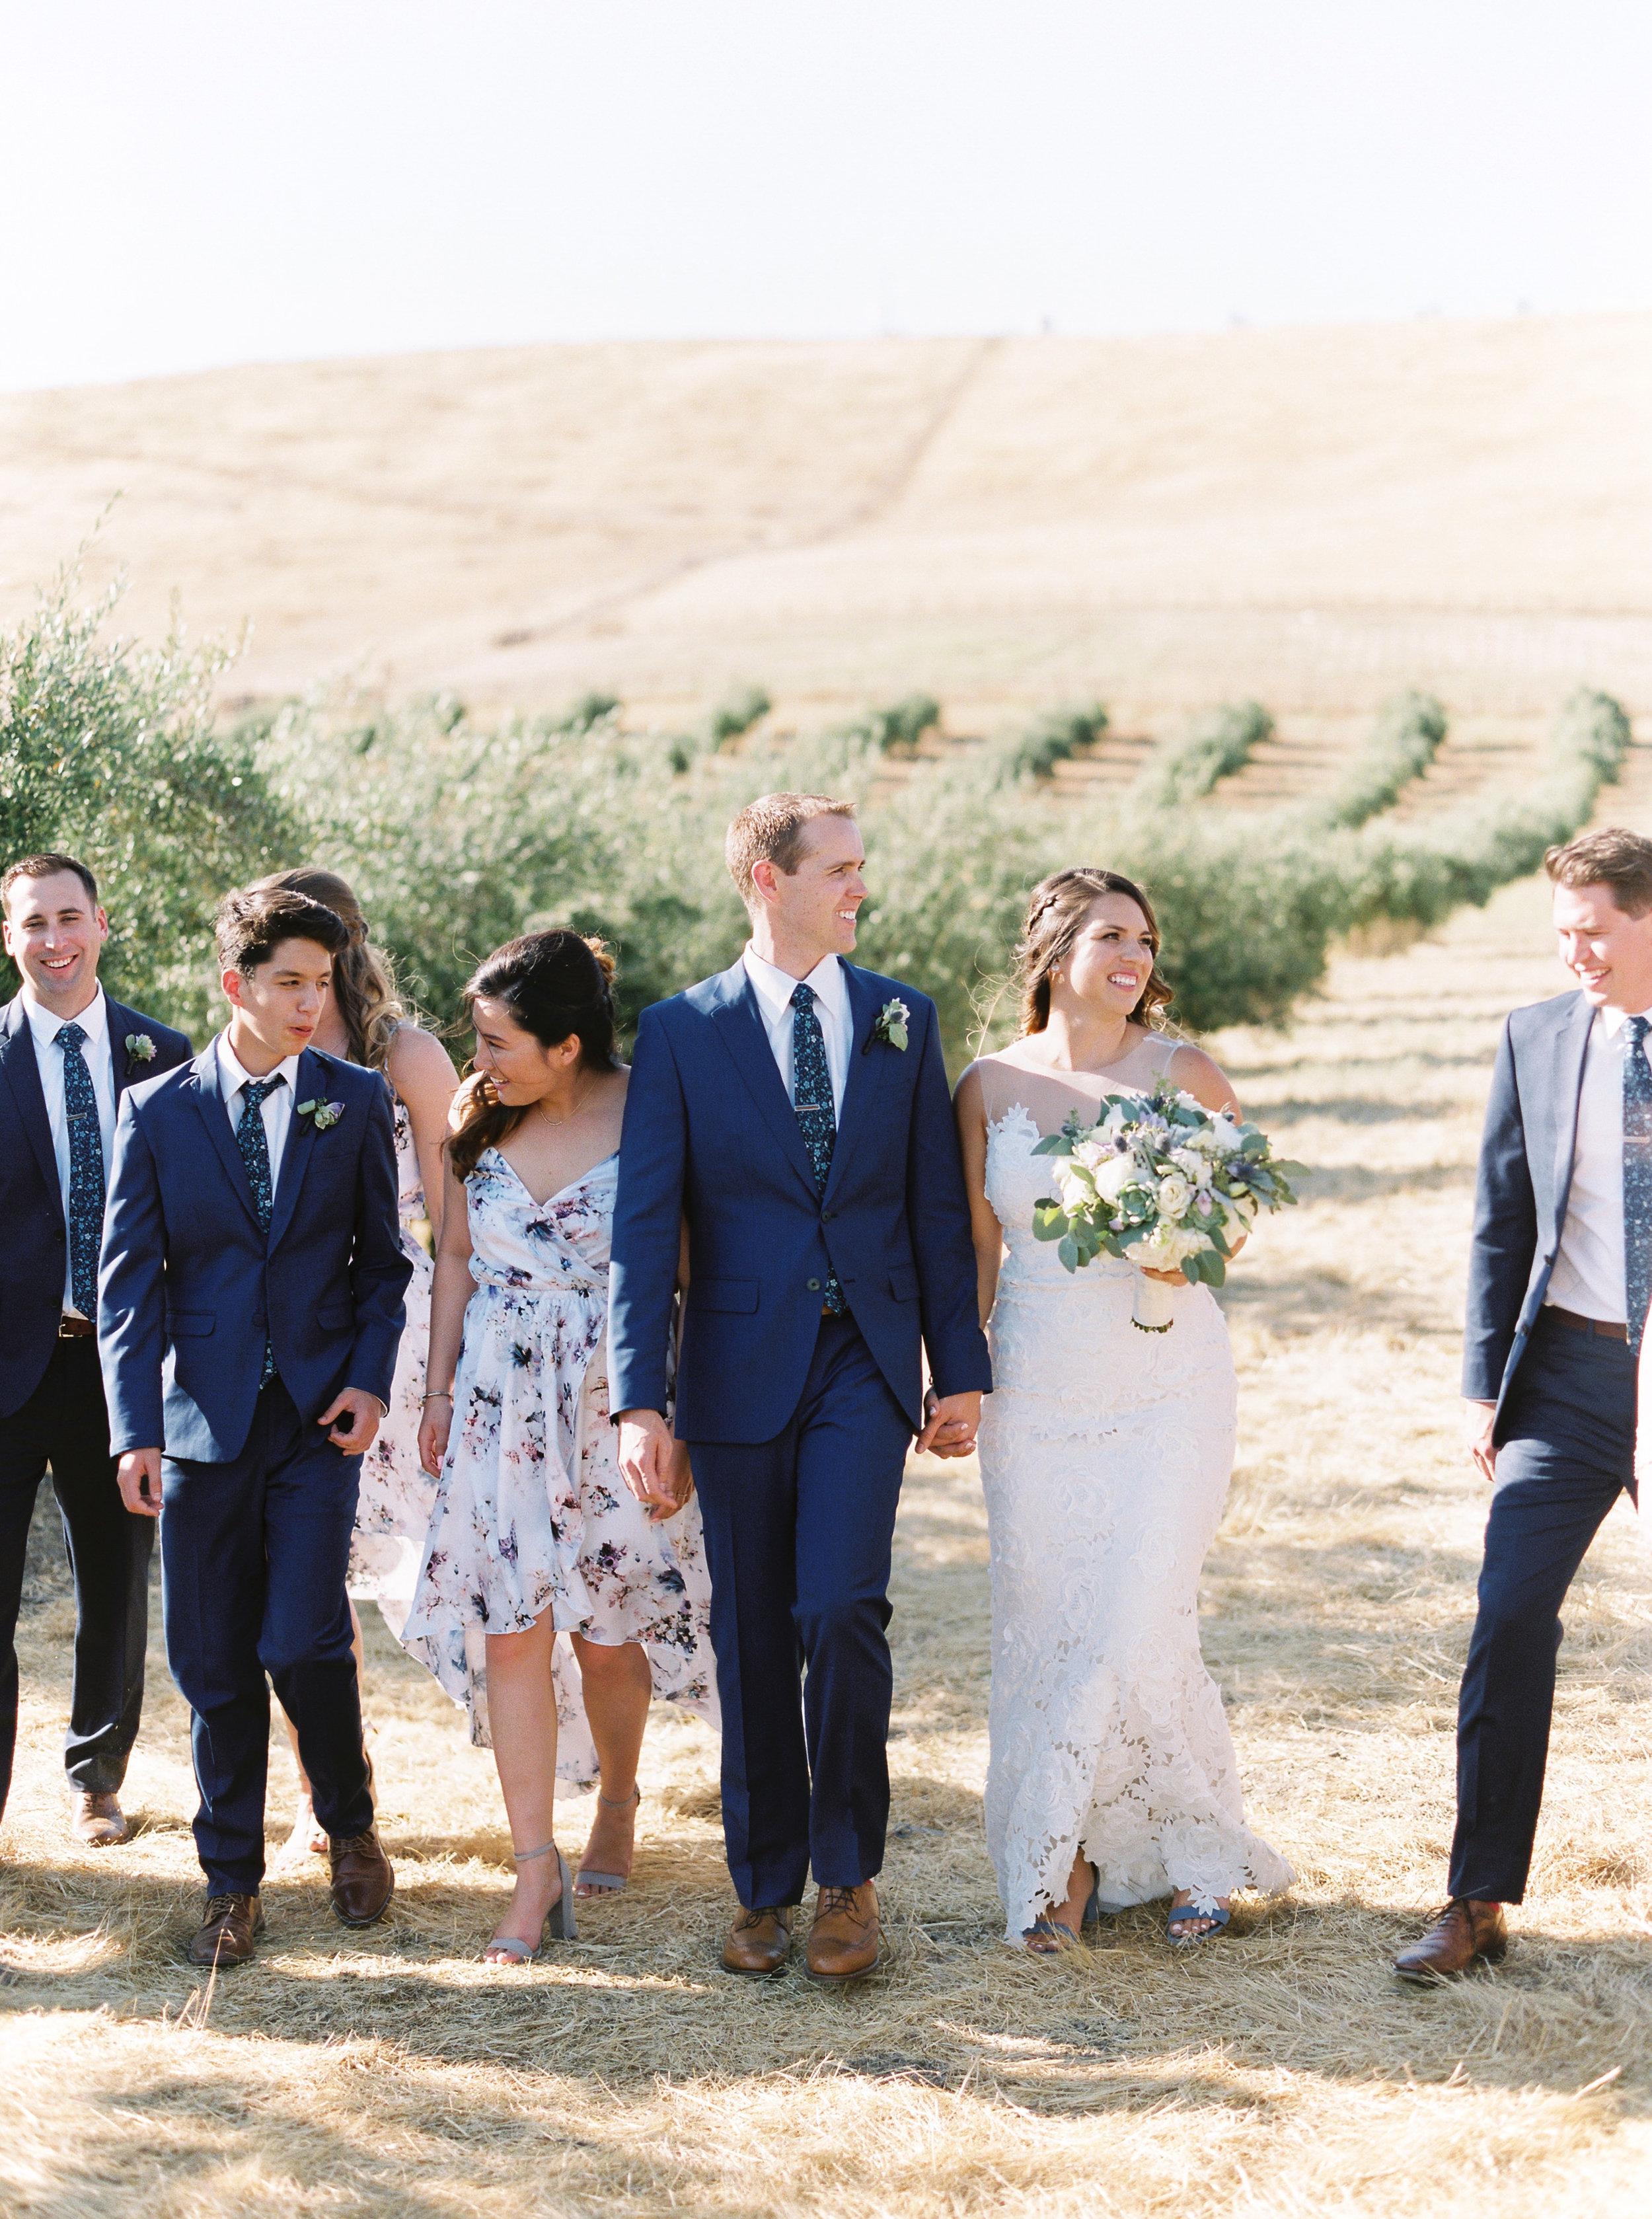 the-purple-orchid-resort-wedding-in-livermore-california-106.jpg